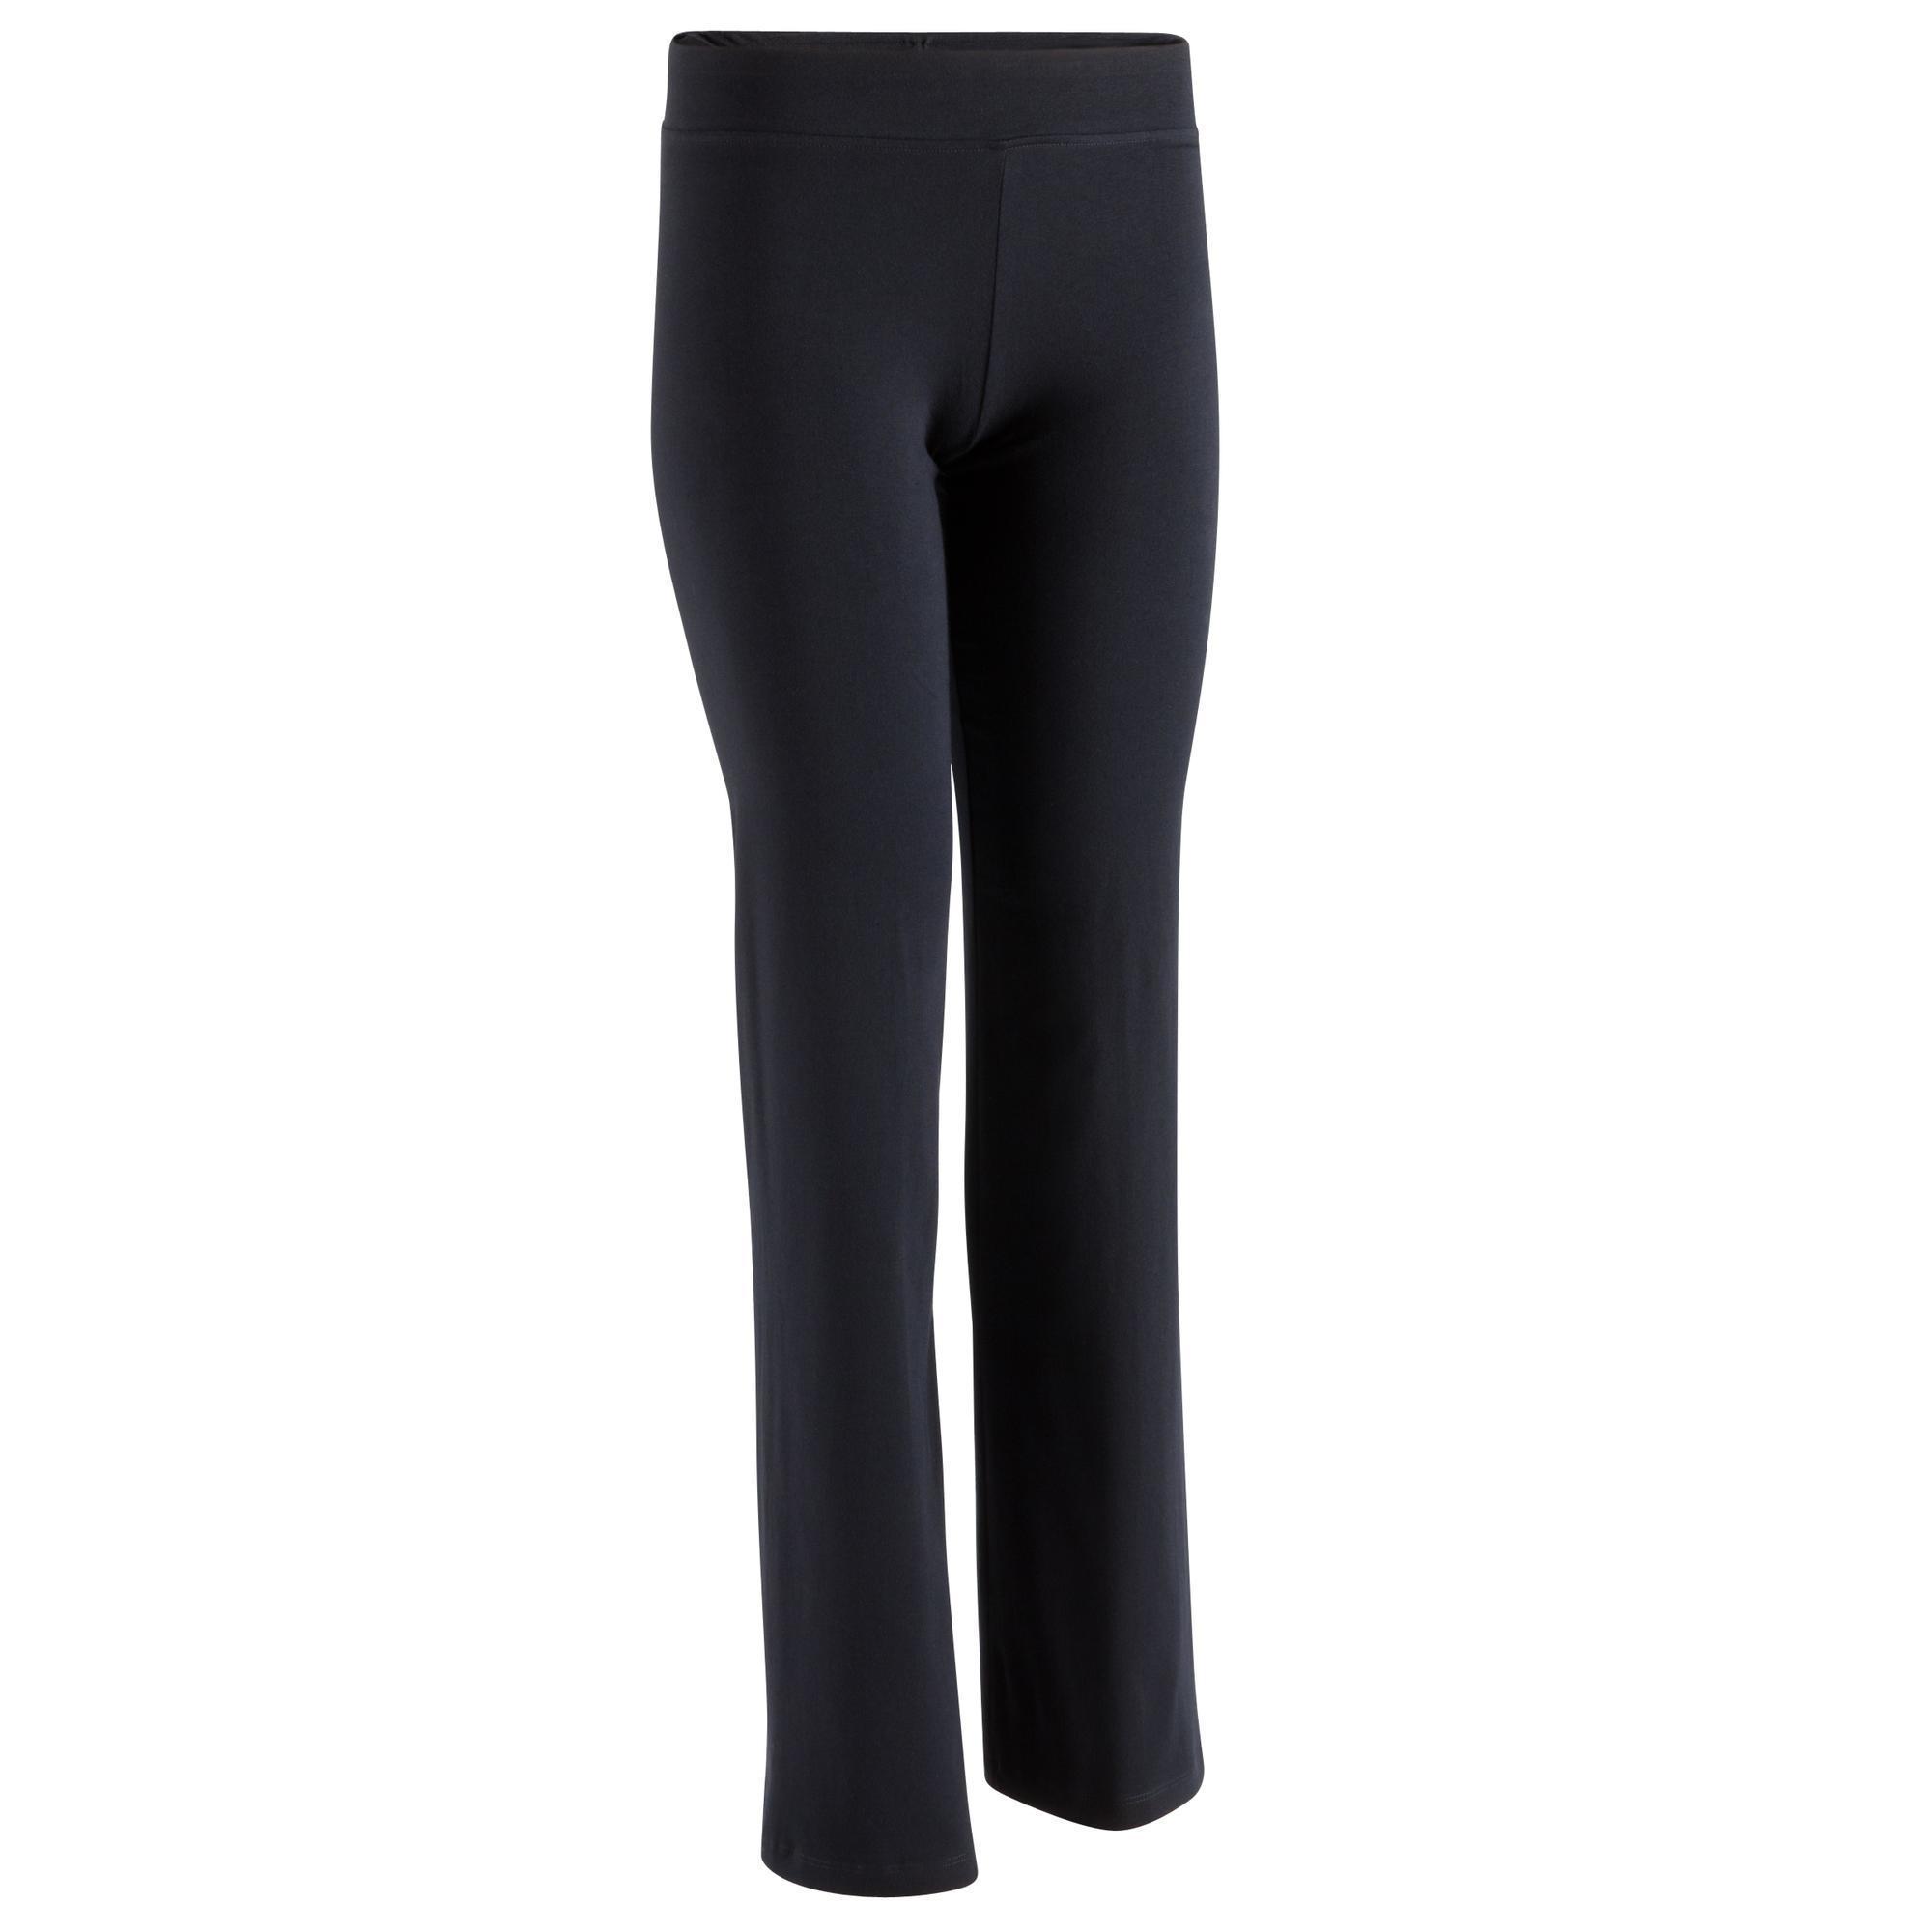 Pantalon FIT+ regular Fitness 5ba9042a5e6